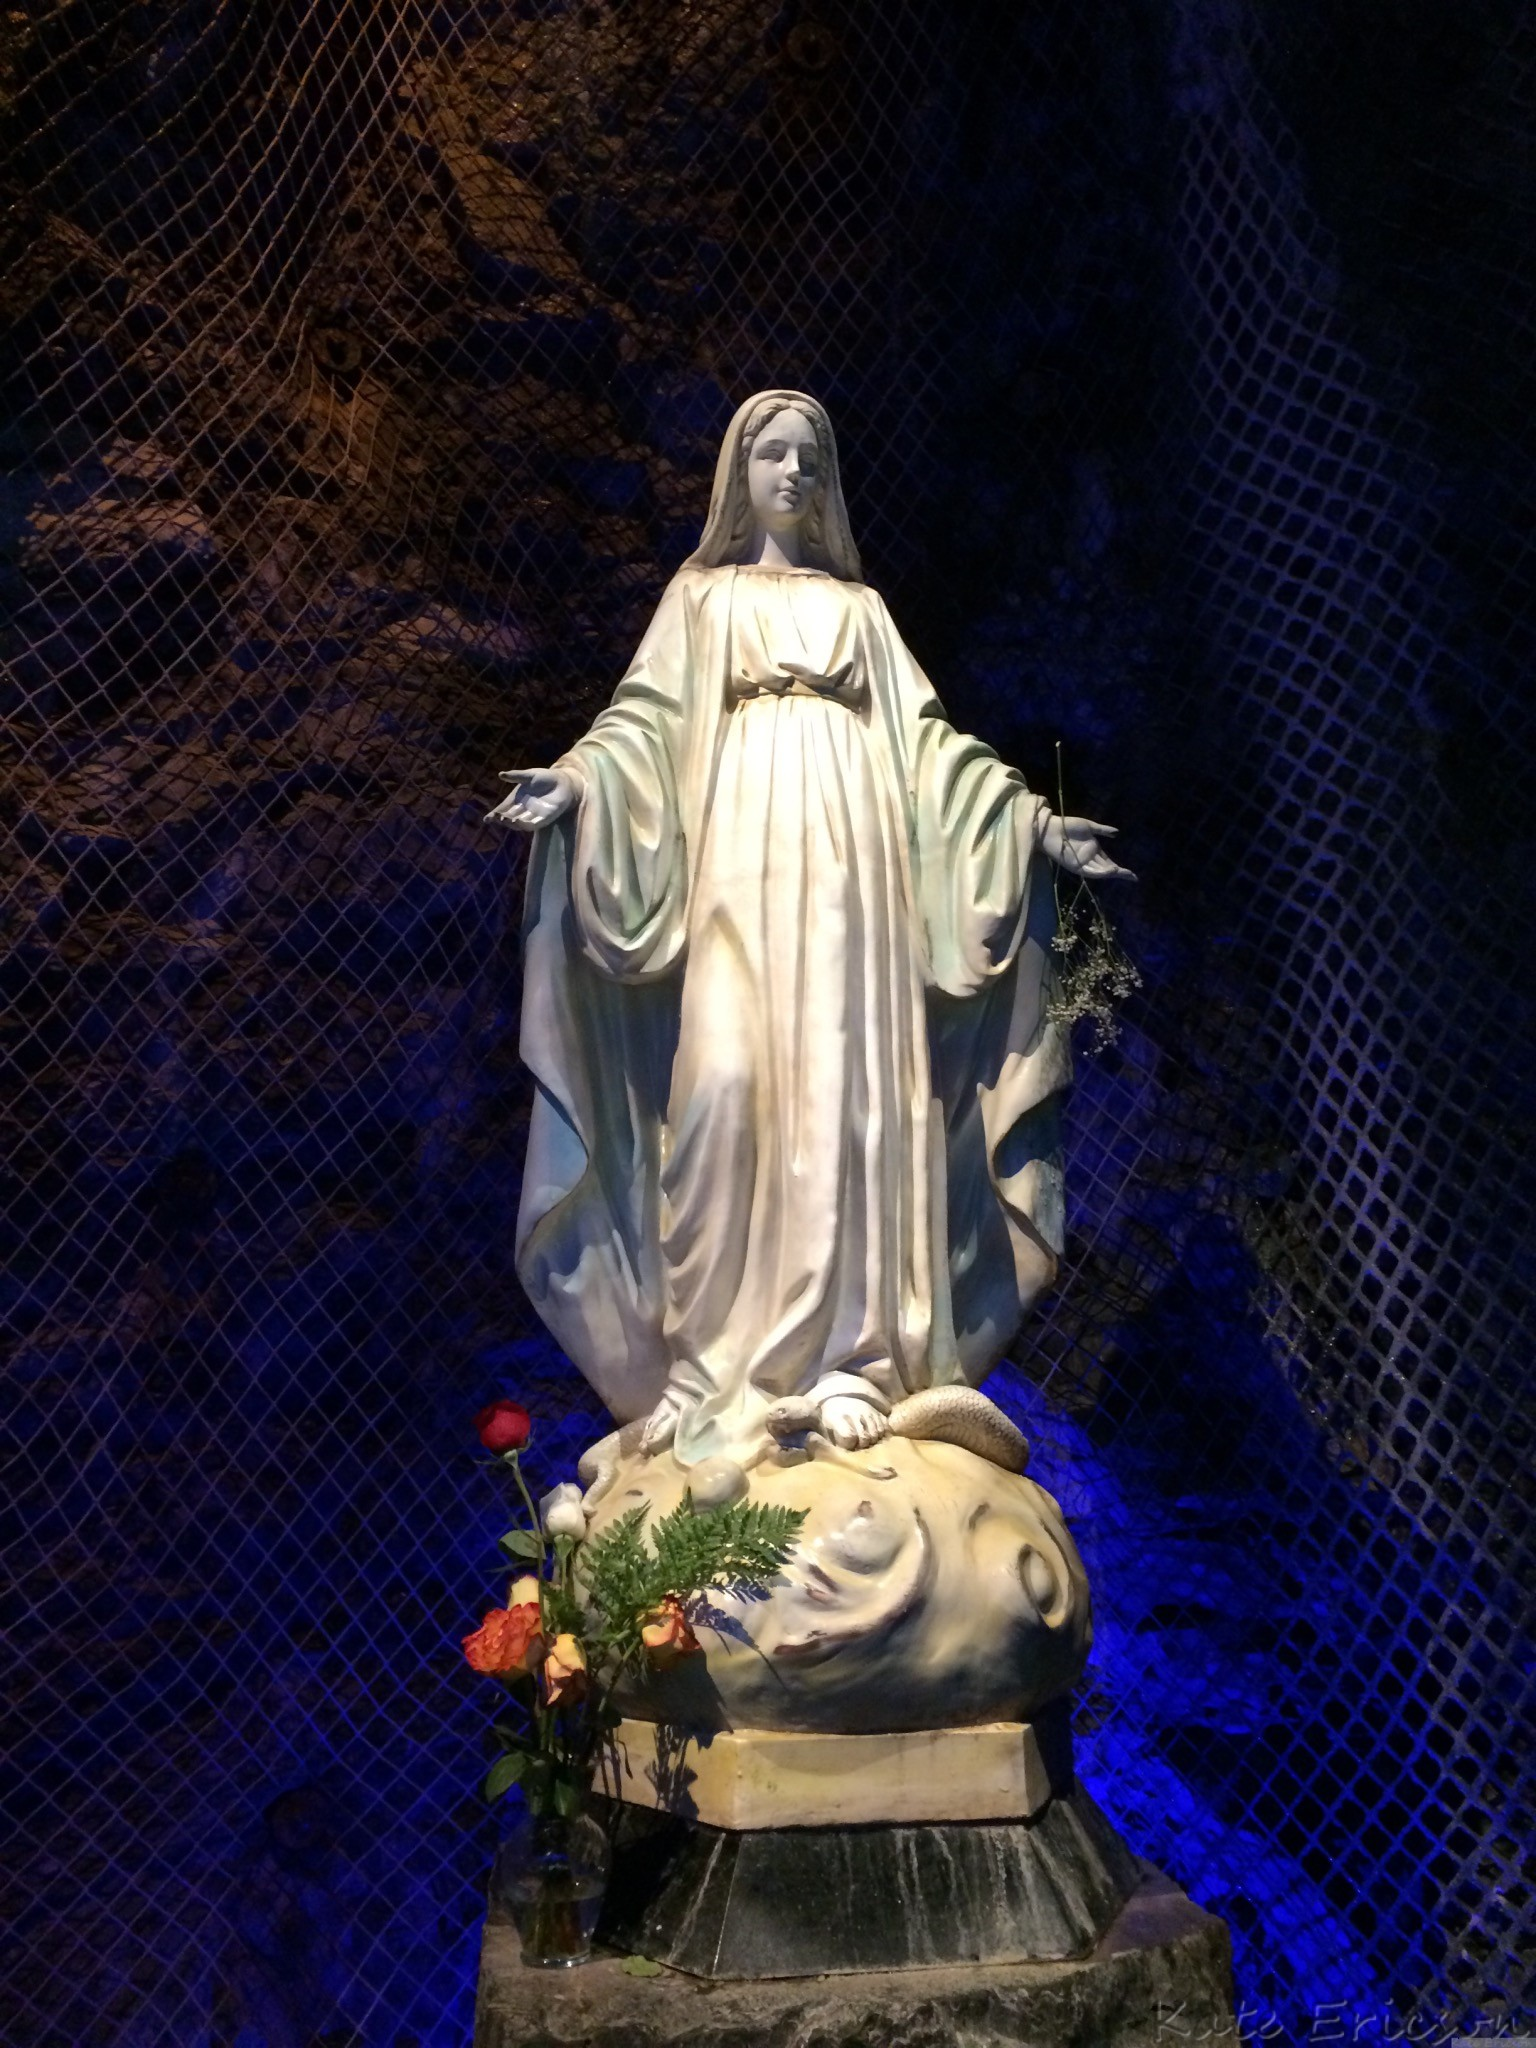 Saint Joseph's Oratory, Montreal, Canada